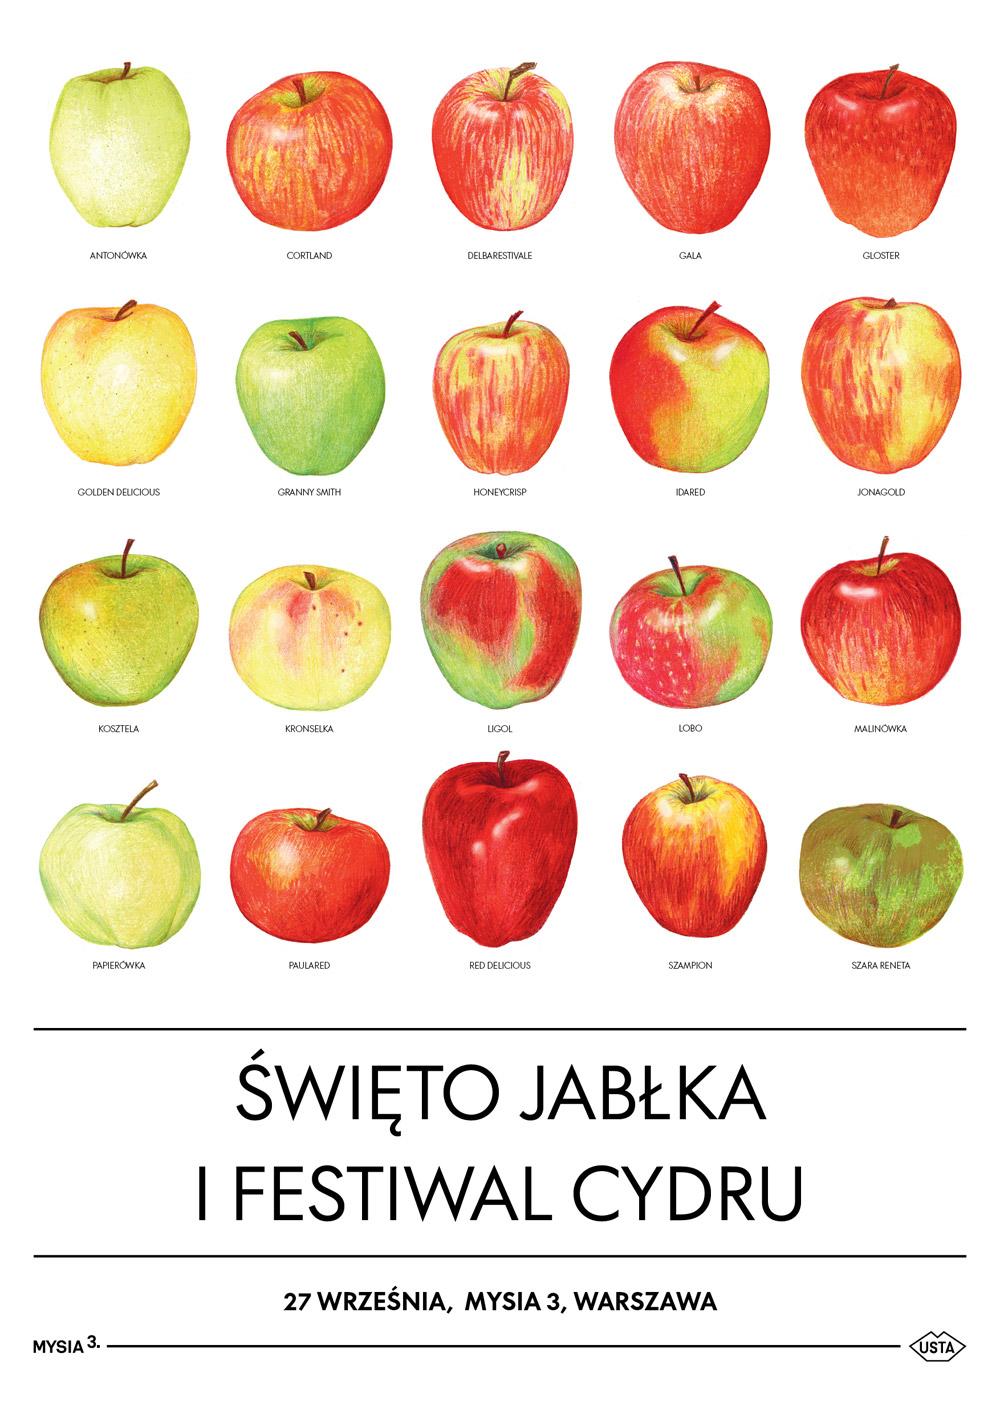 Jabłka i cydry